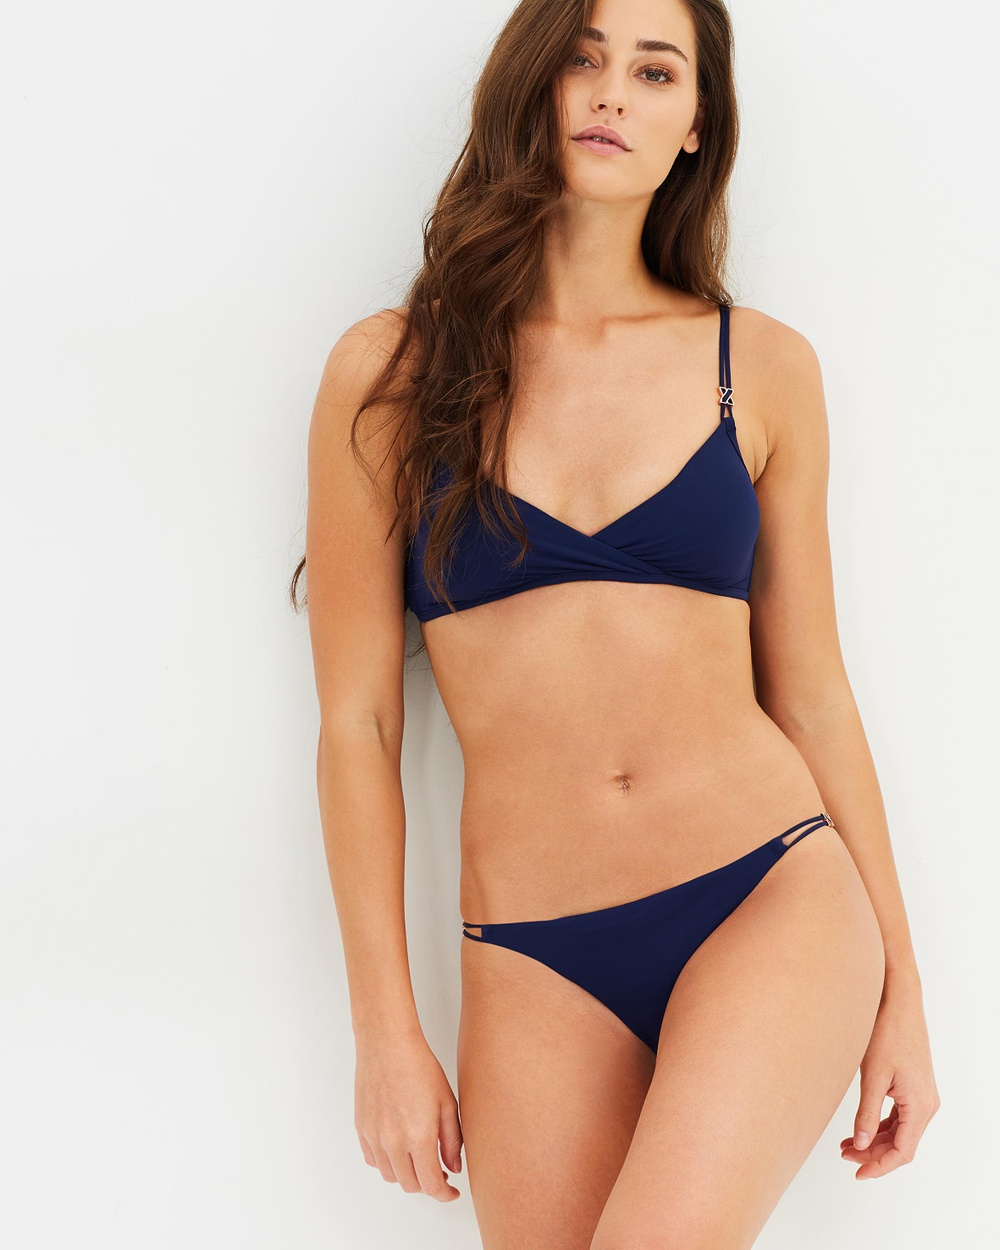 Heidi Klum Swim Anse Cocos String Bikini Bottoms Bikini Bottoms Indigo Anse Cocos String Bikini Bottoms